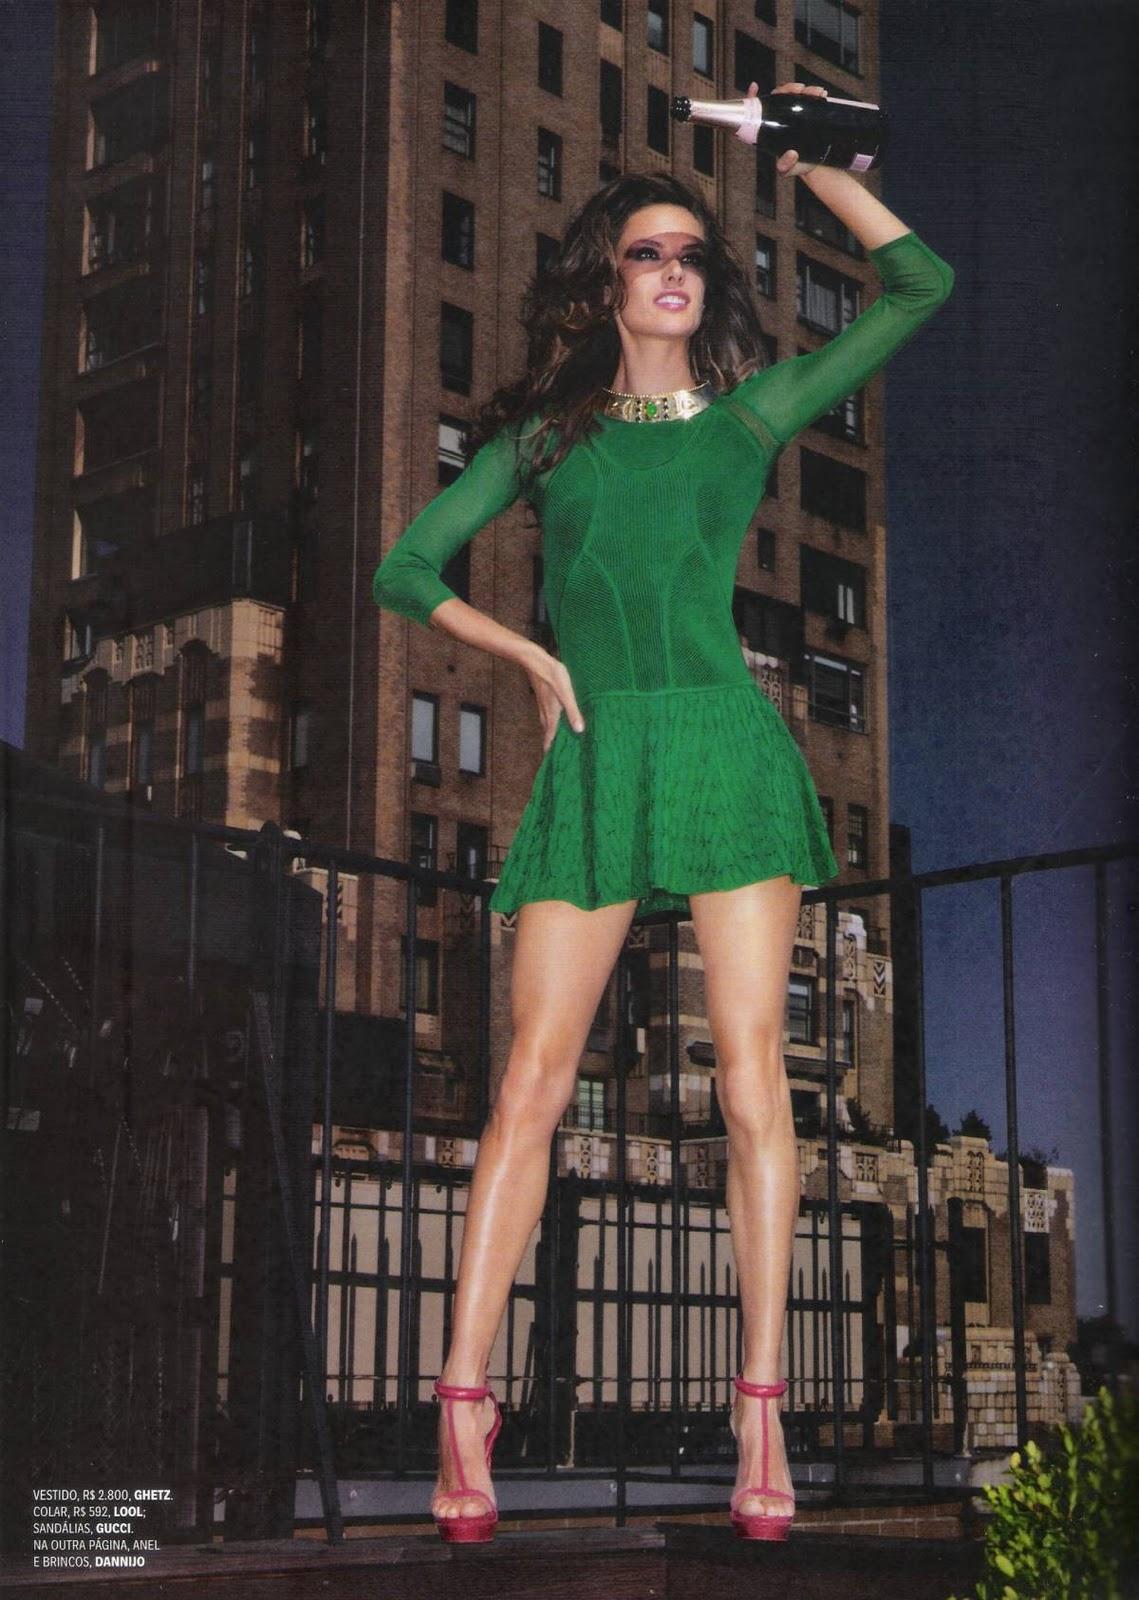 http://1.bp.blogspot.com/-h506MXe66_k/Tv6NCHrPcYI/AAAAAAAAyJA/_HIlU9SfED4/s1600/Vogue_Brasil_Dezembro2011_ph_Michael_Roberts_05.jpg